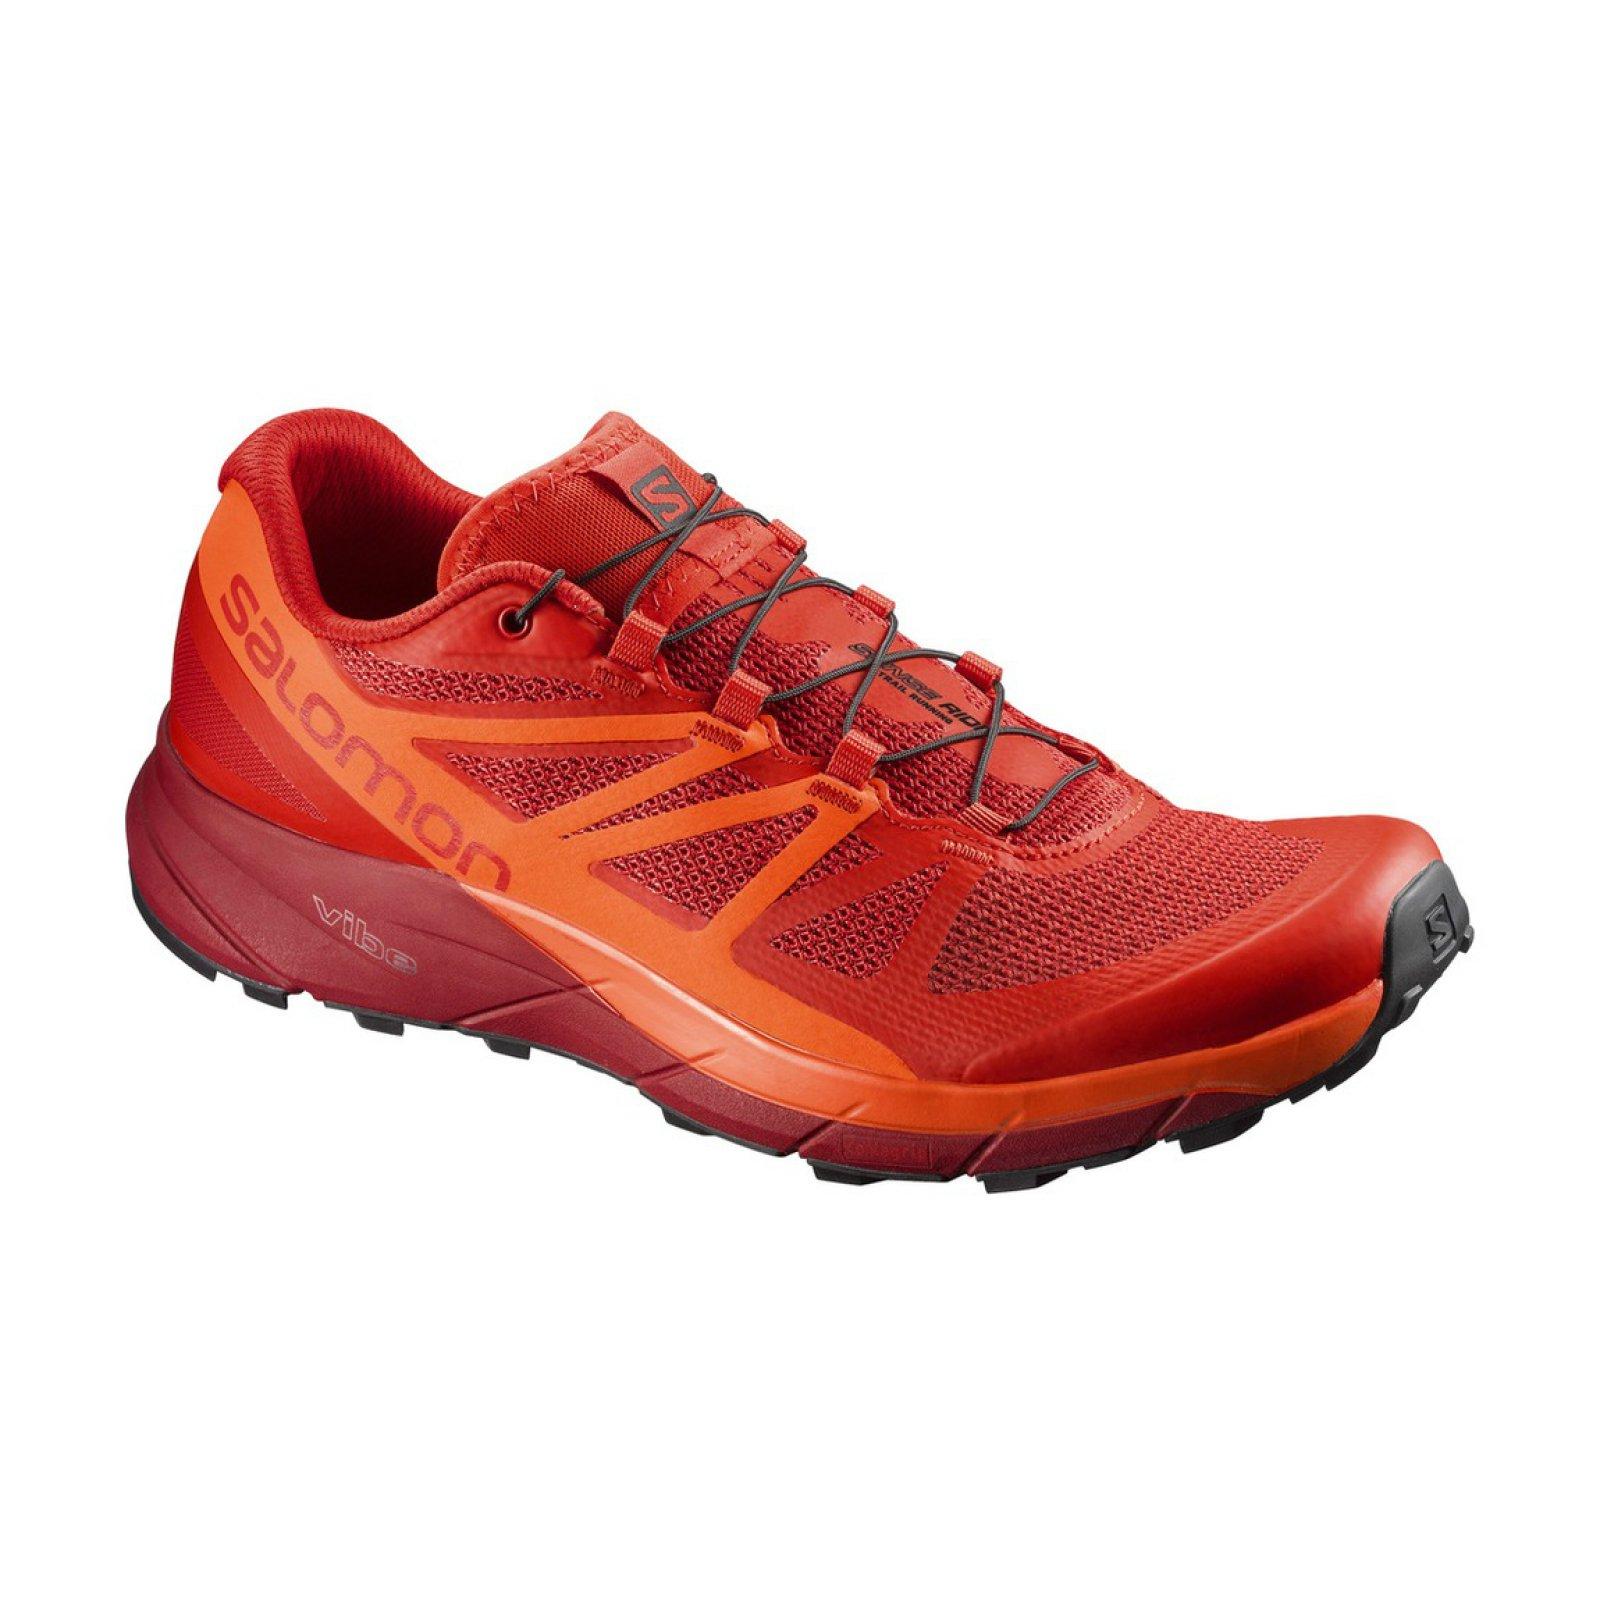 Trailové běžecké boty Salomon Sense Ride M L39849000 - Actisport.cz 7b2ae0dc70c